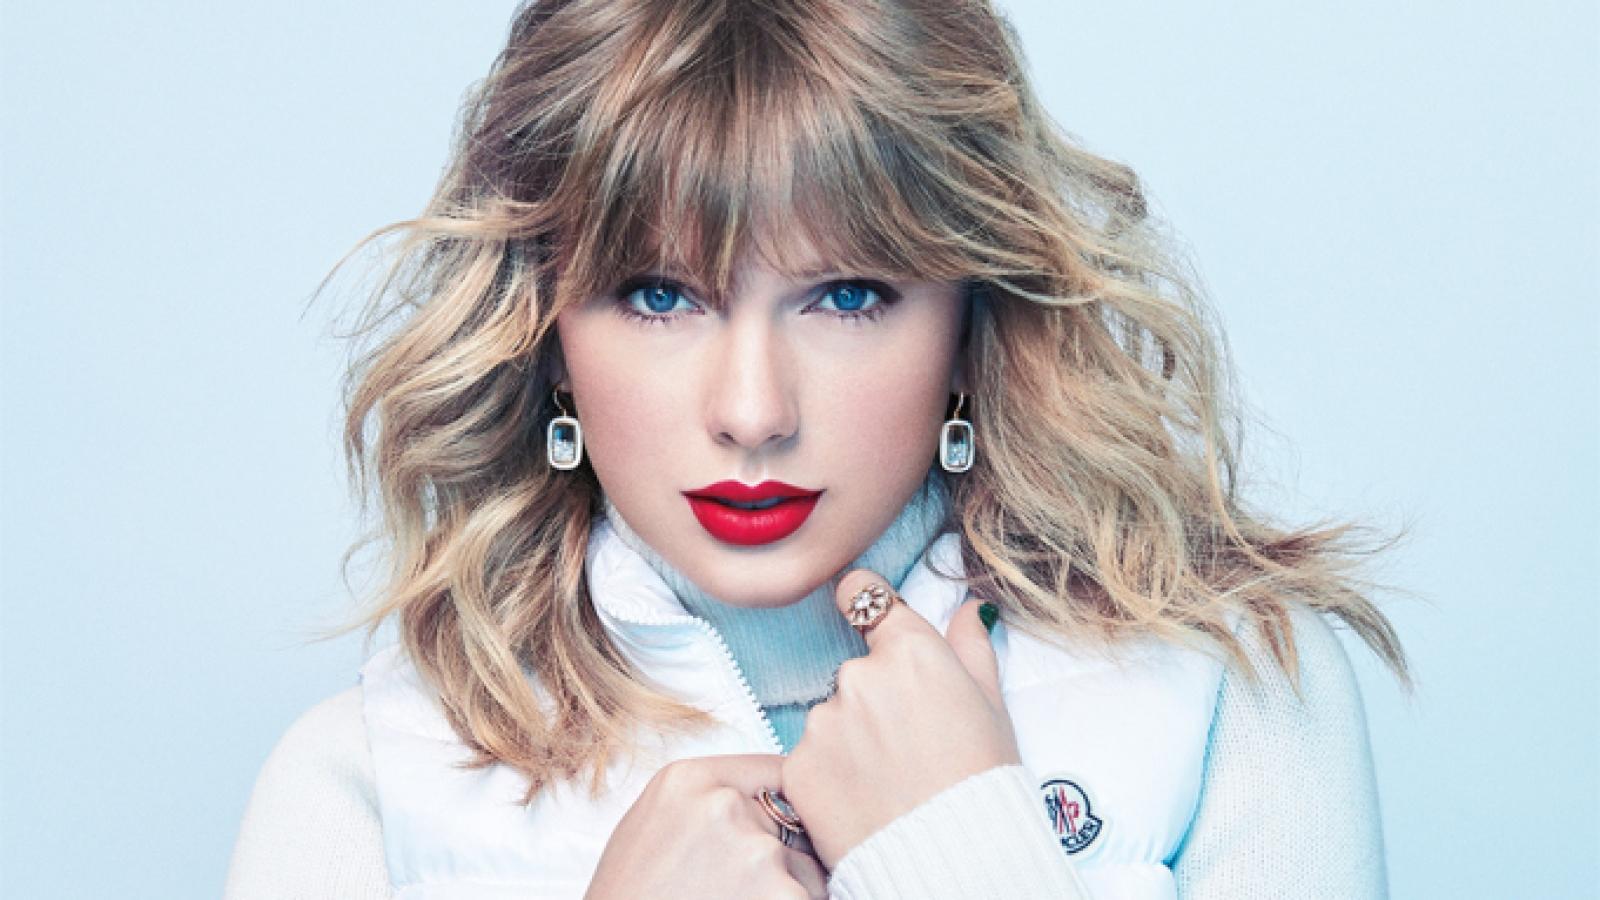 Taylor Swift tham gia một bộ phim của David O. Russell